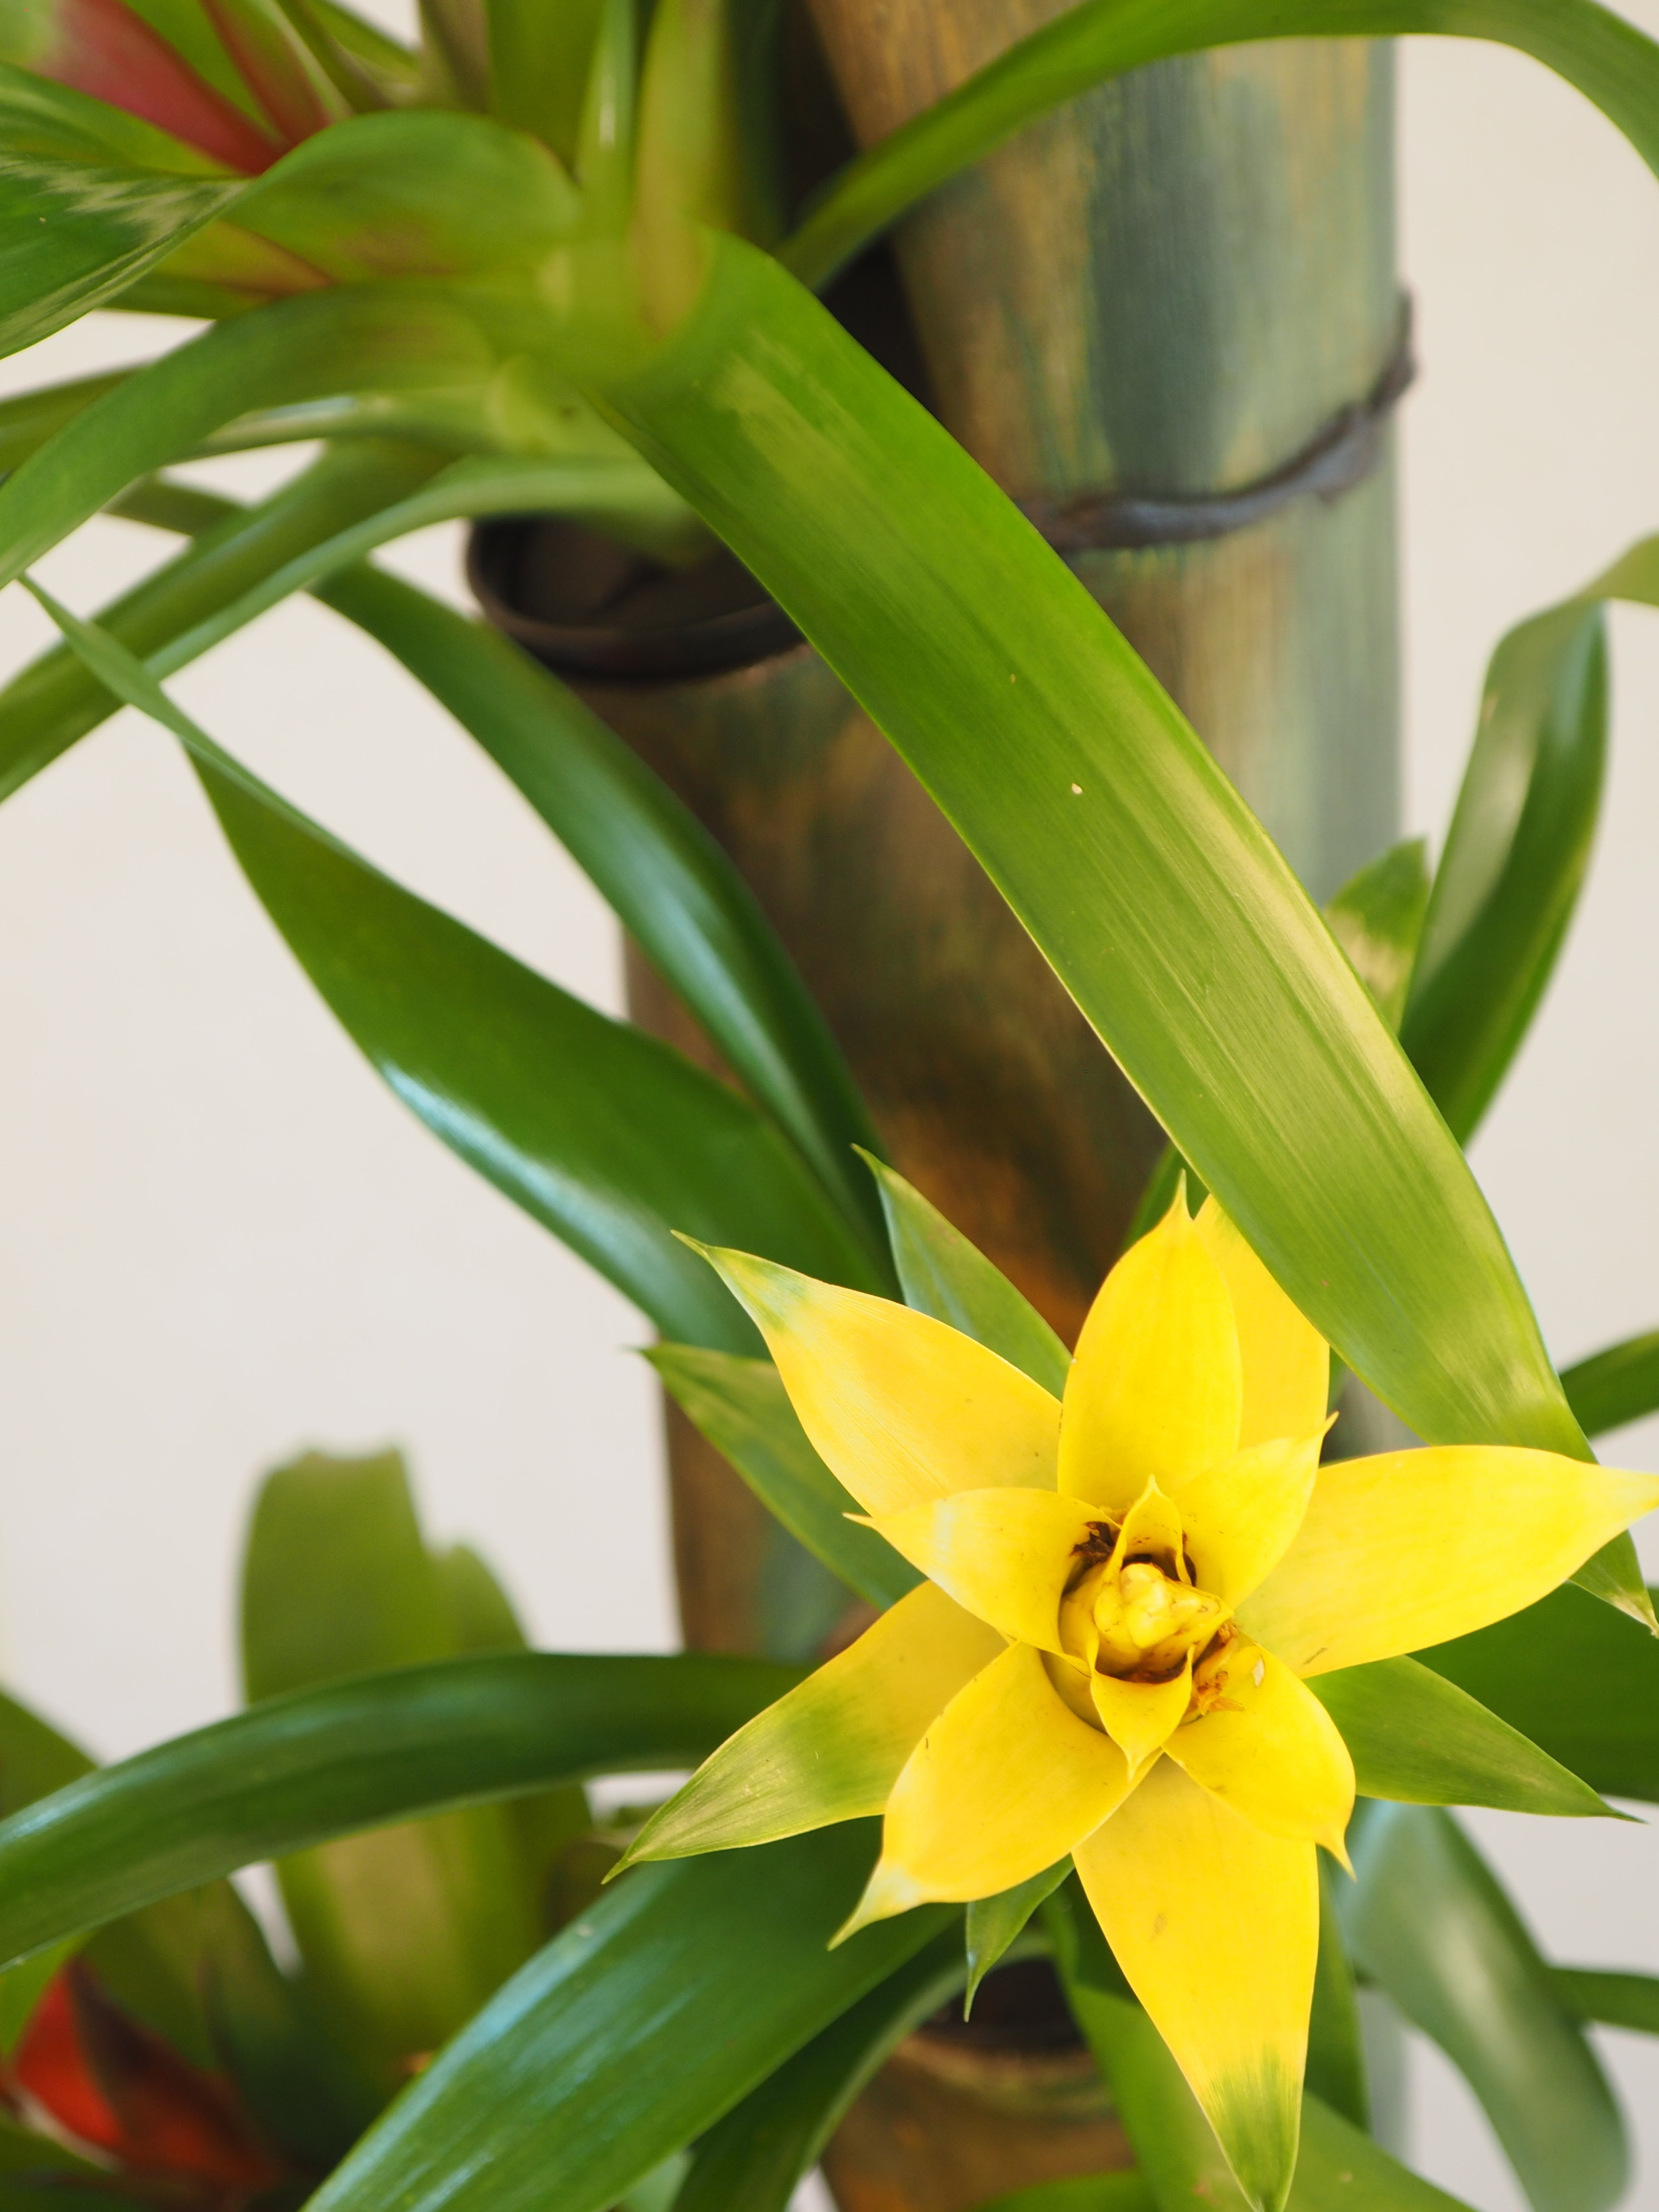 YellowBrommeliadonBamboo.JPG